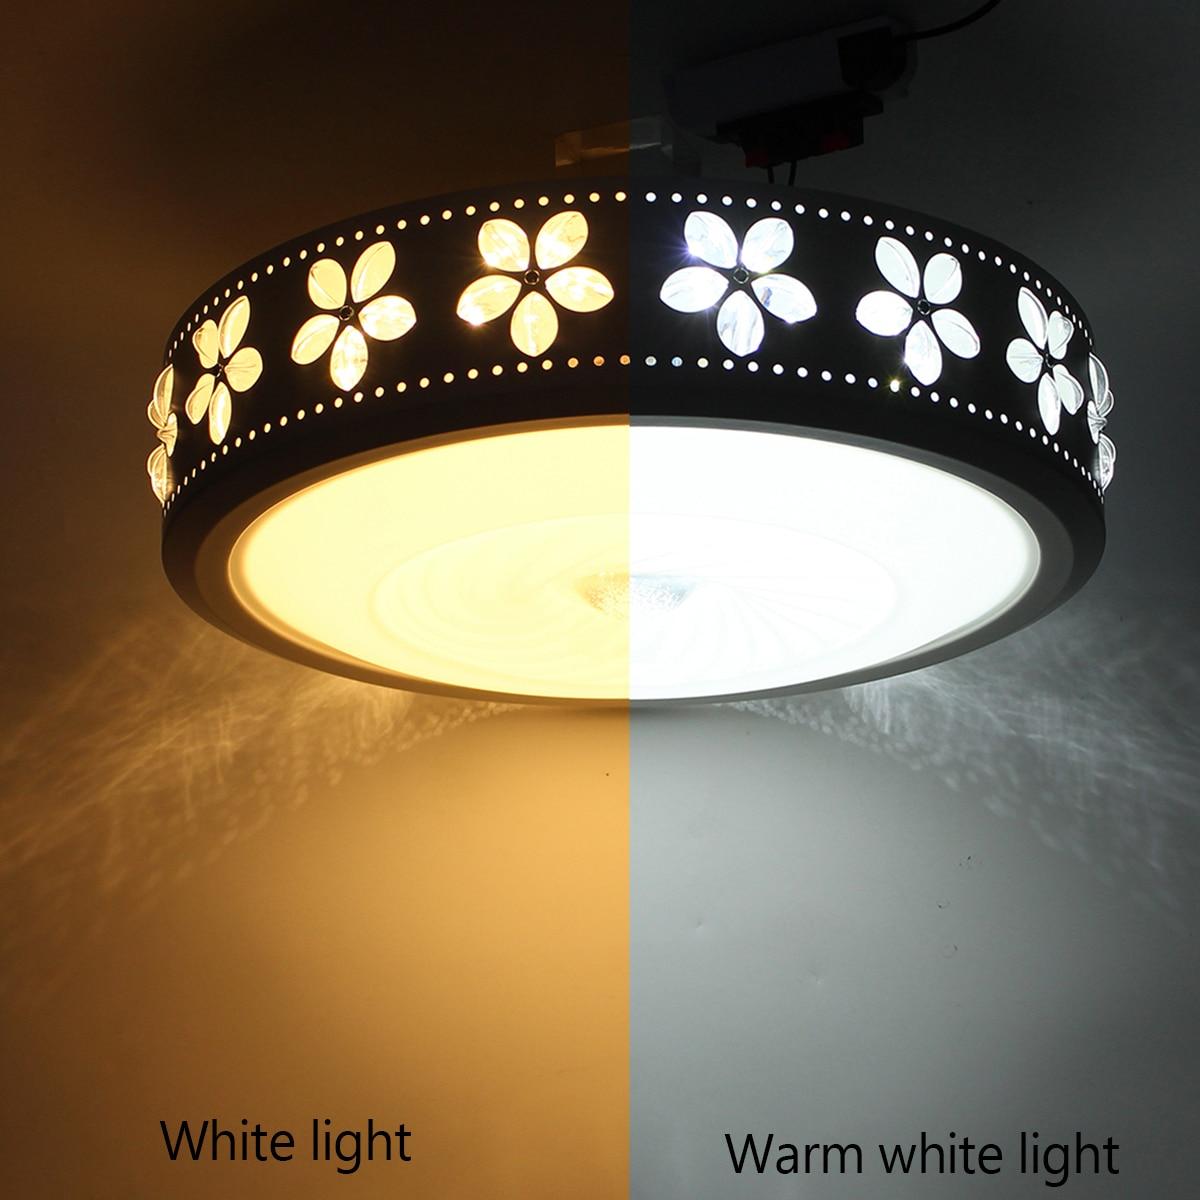 купить AC 100-240V 24W 42cm Round Led Ceiling Lamp Modern Ceiling Lights for Living Room Fixture Light Decoration lamparas de techo по цене 3314.2 рублей